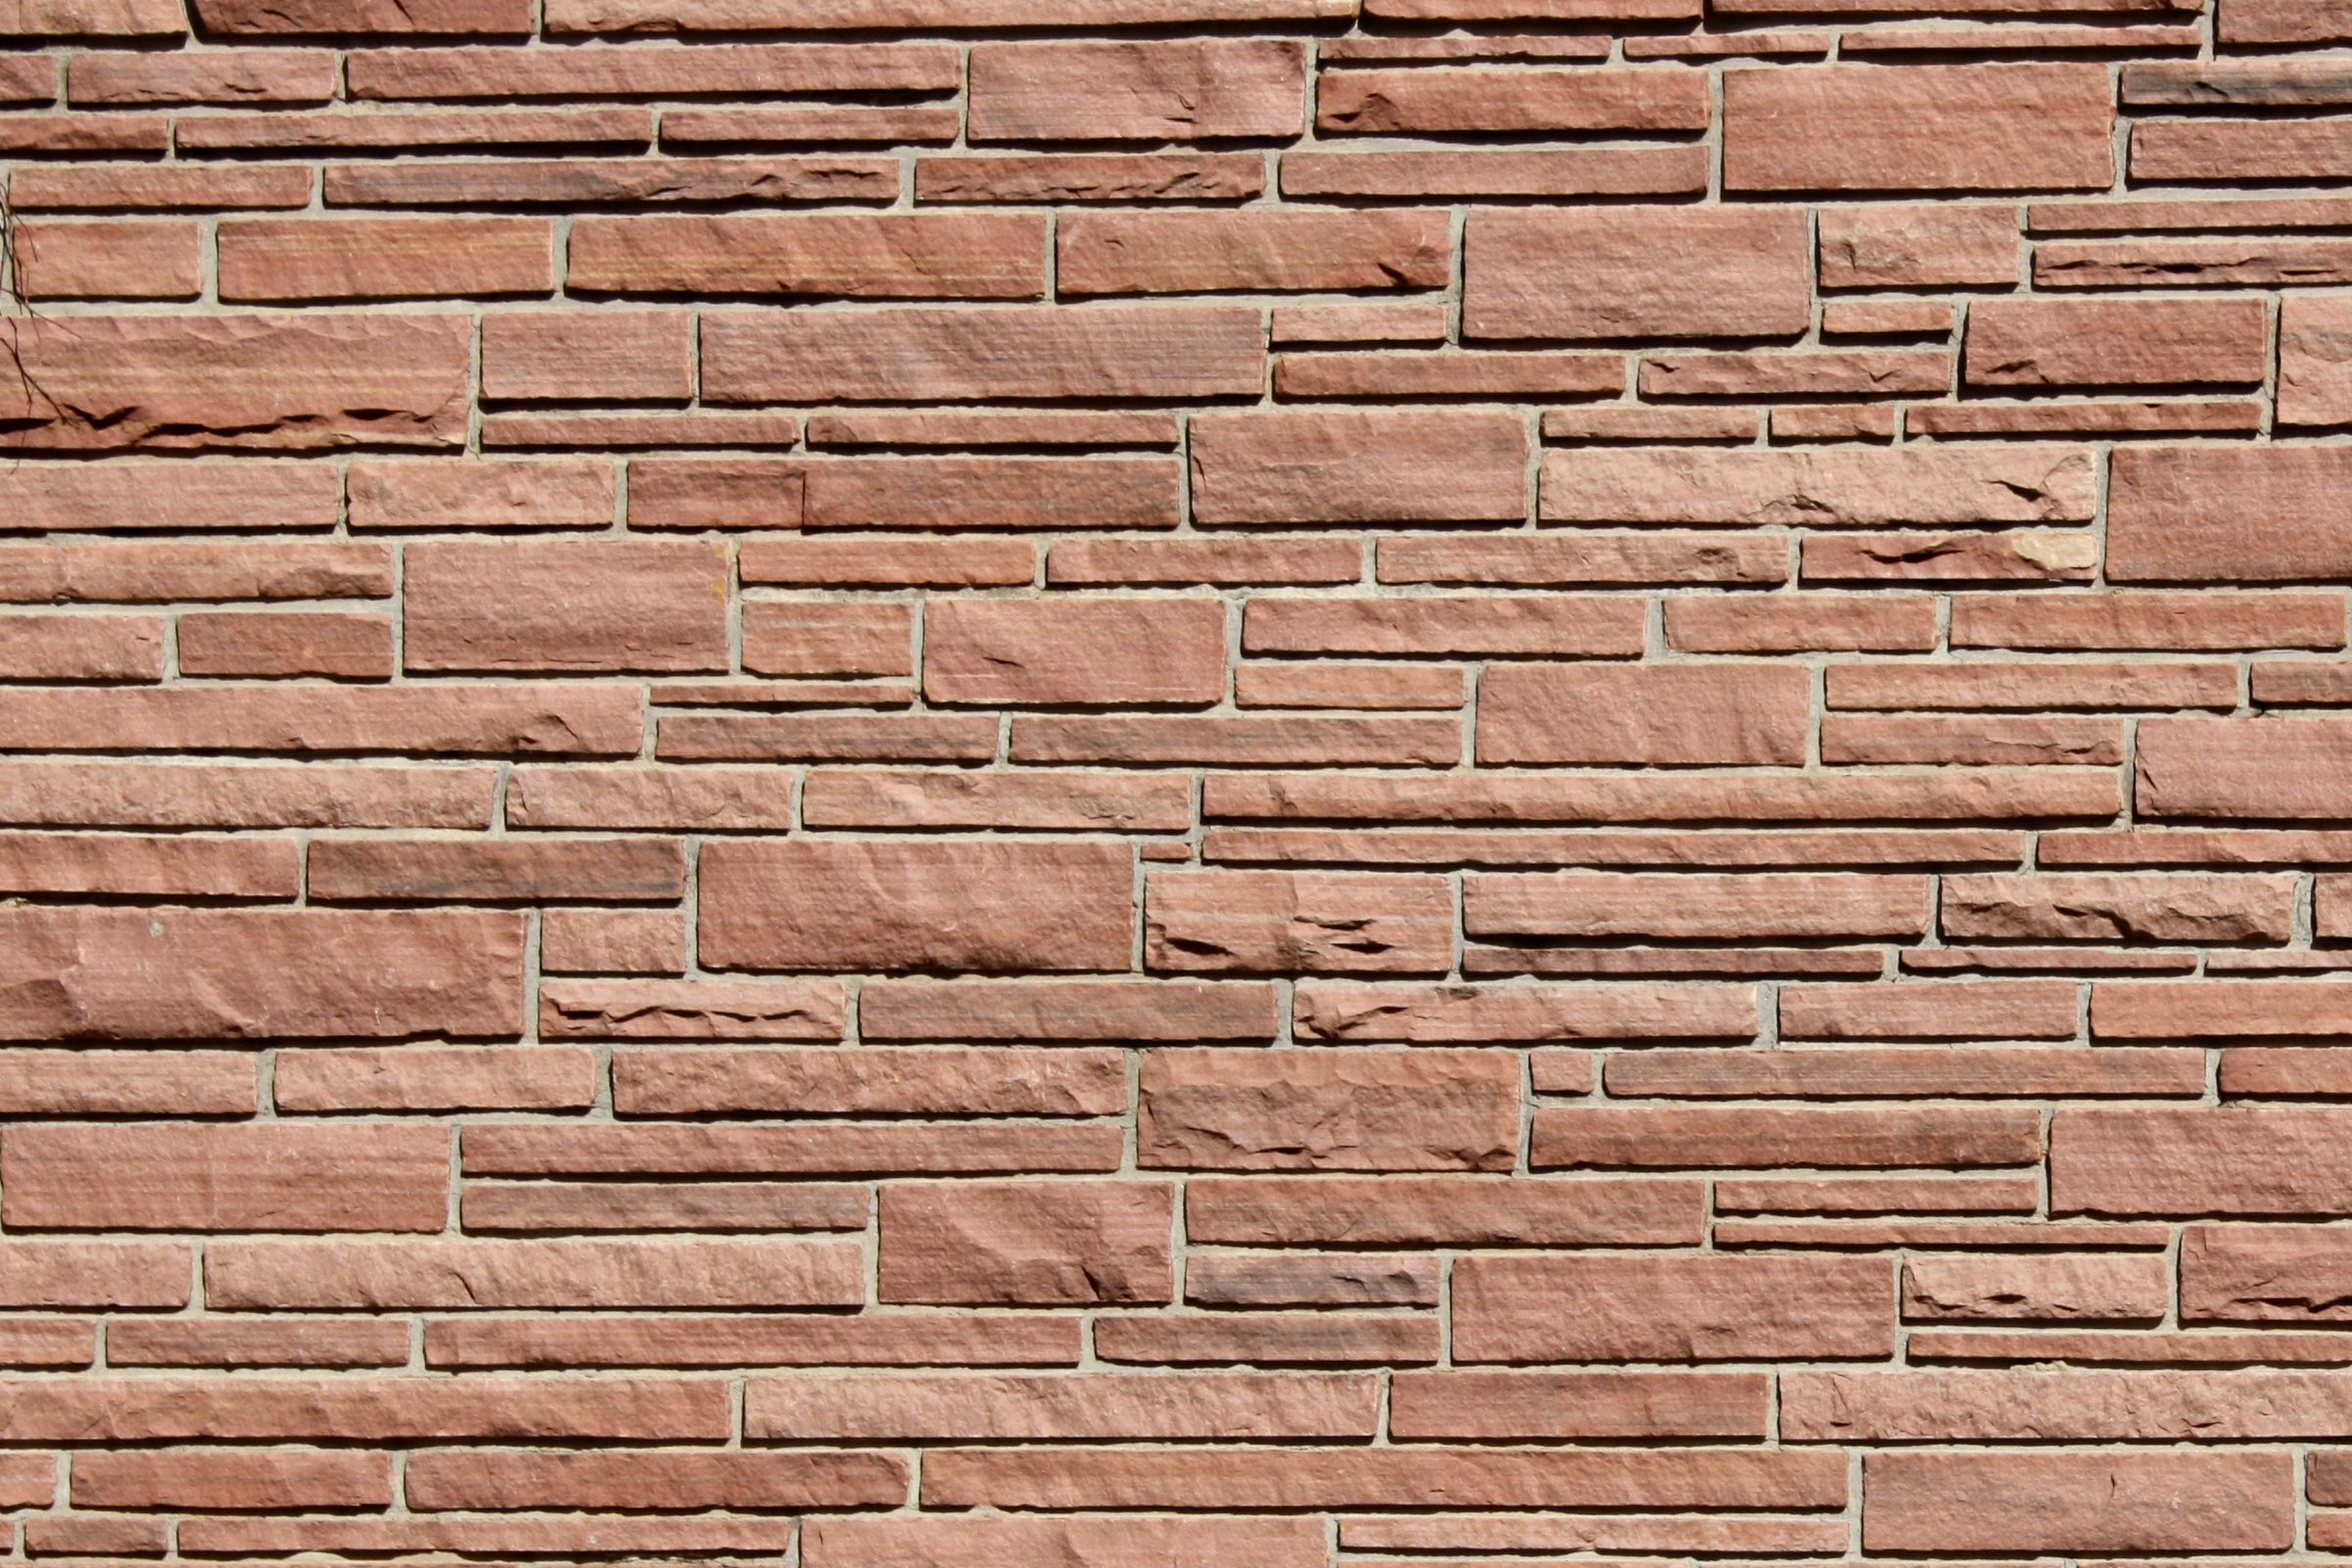 49 Brick Wallpaper With Texture On Wallpapersafari